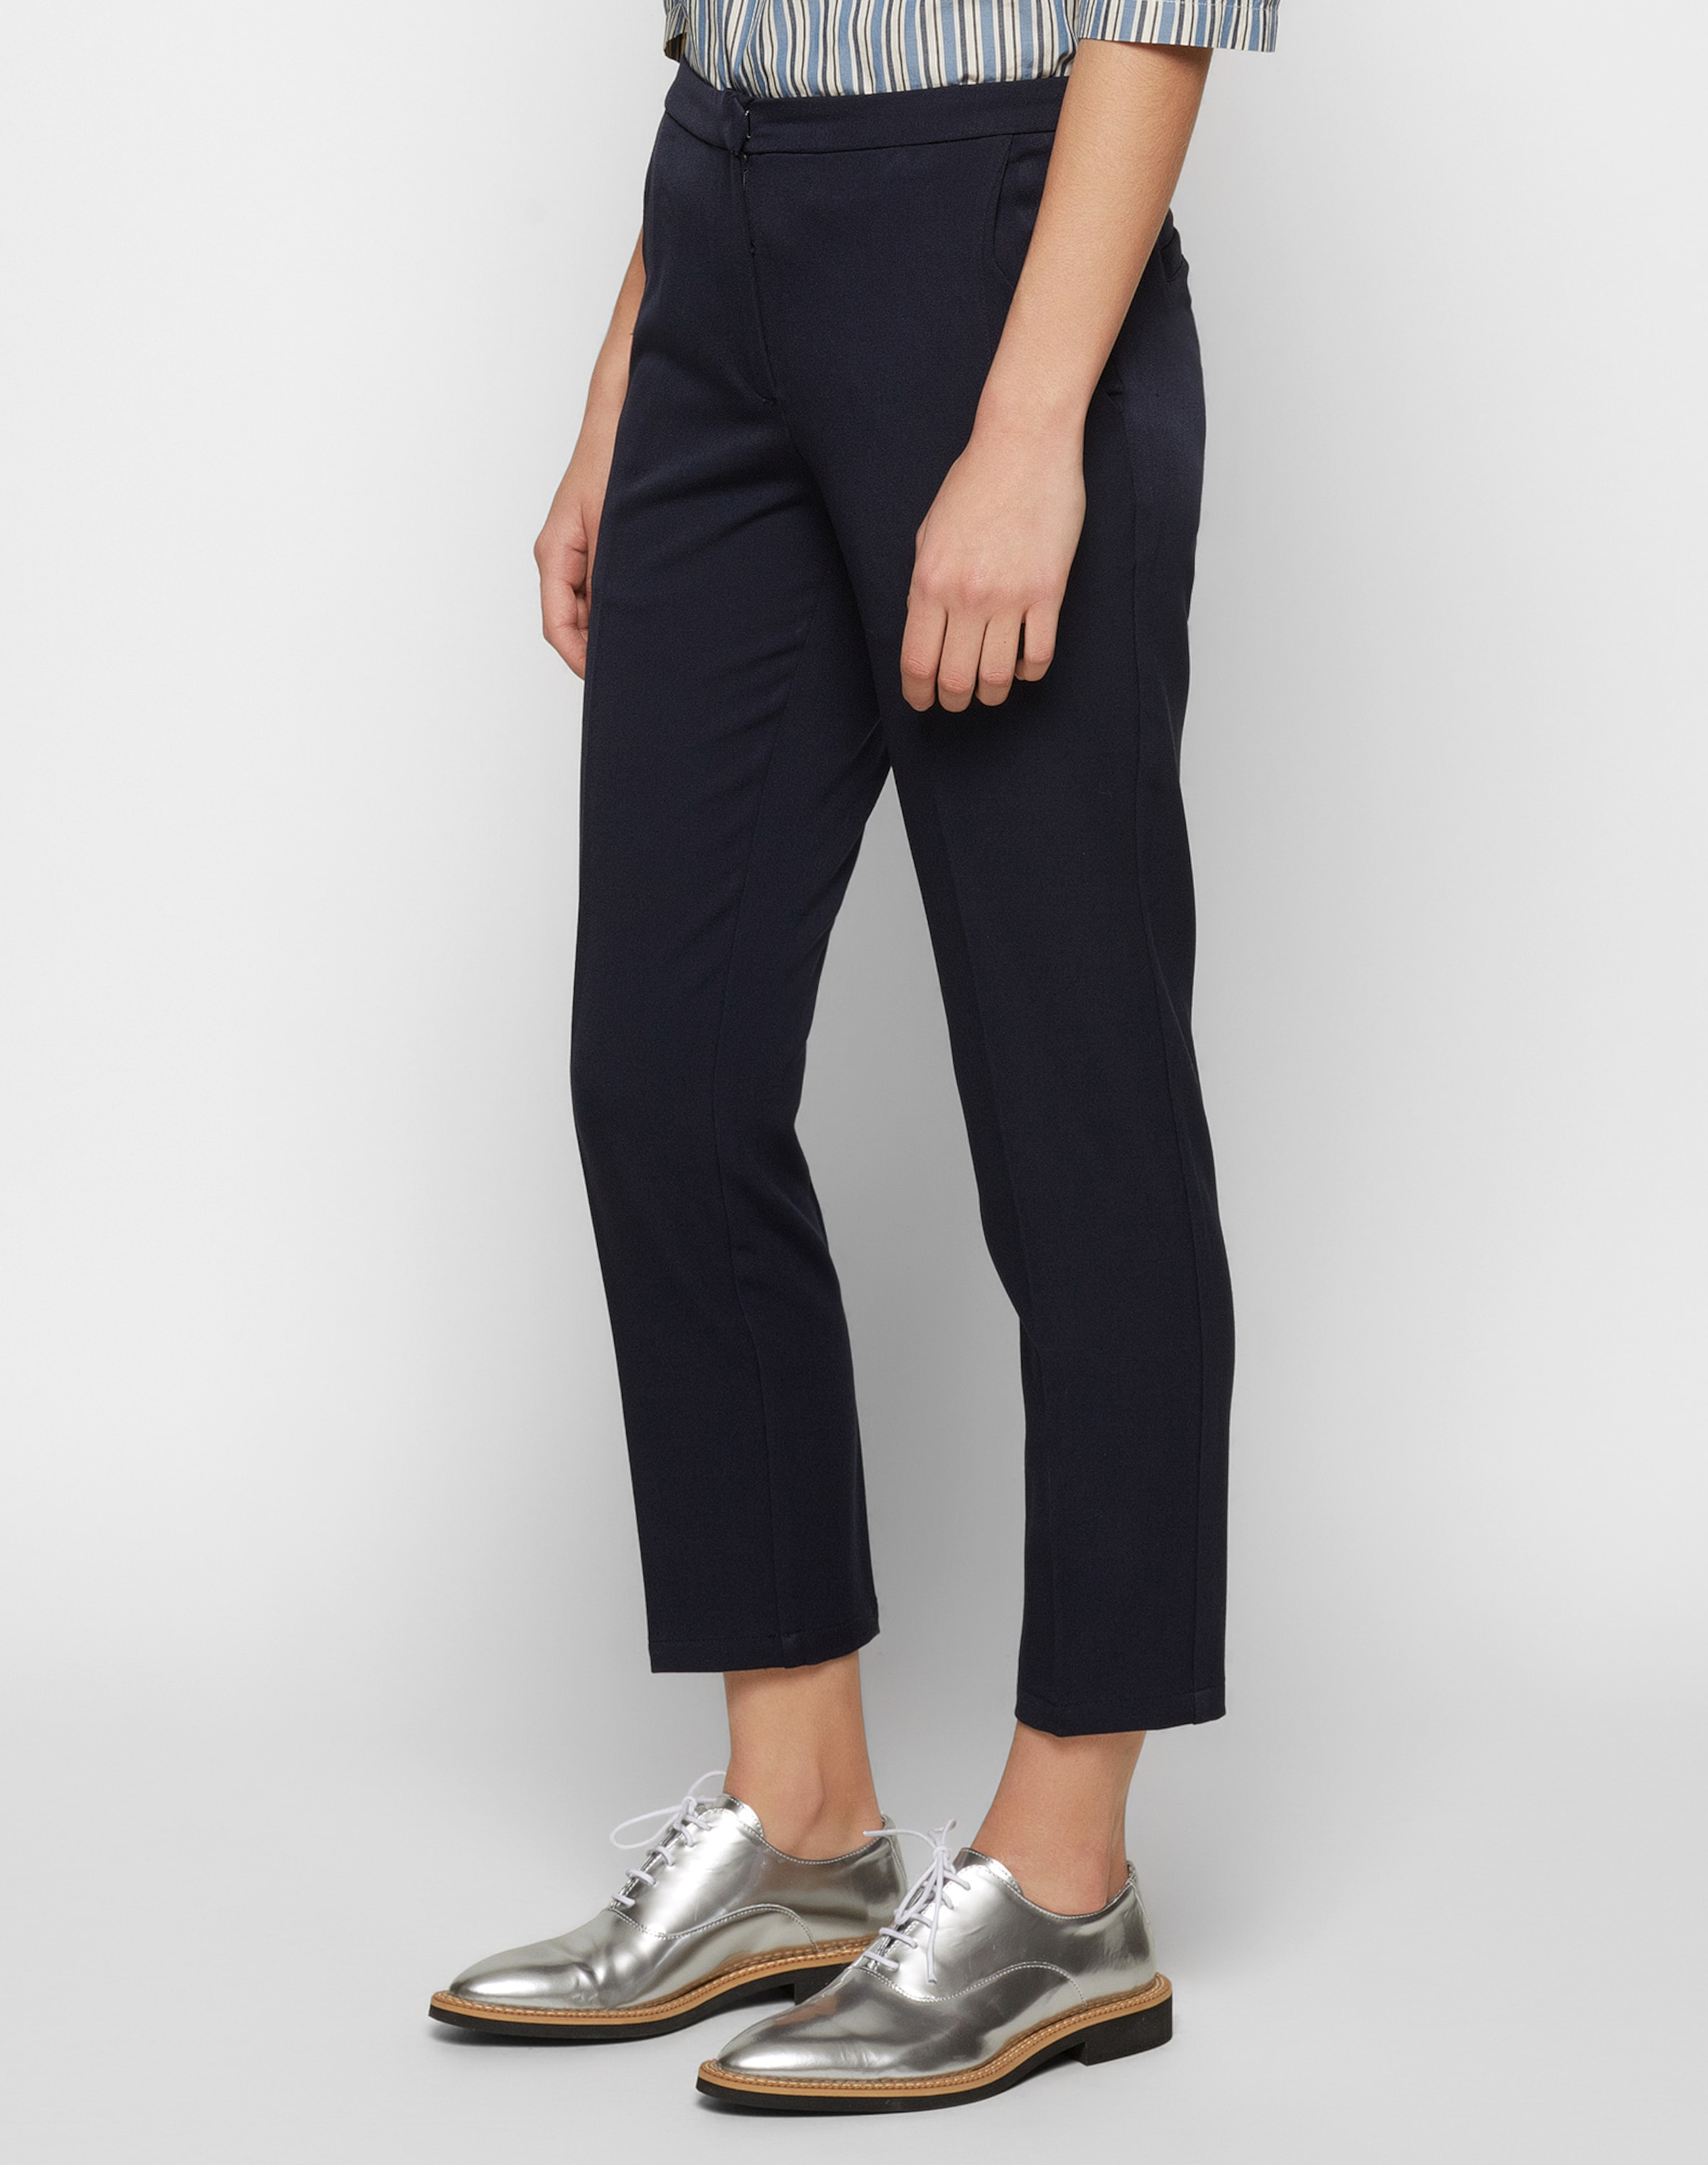 'halle' À Pince Marine Pantalon Bleu Minimum En OXukTZiP